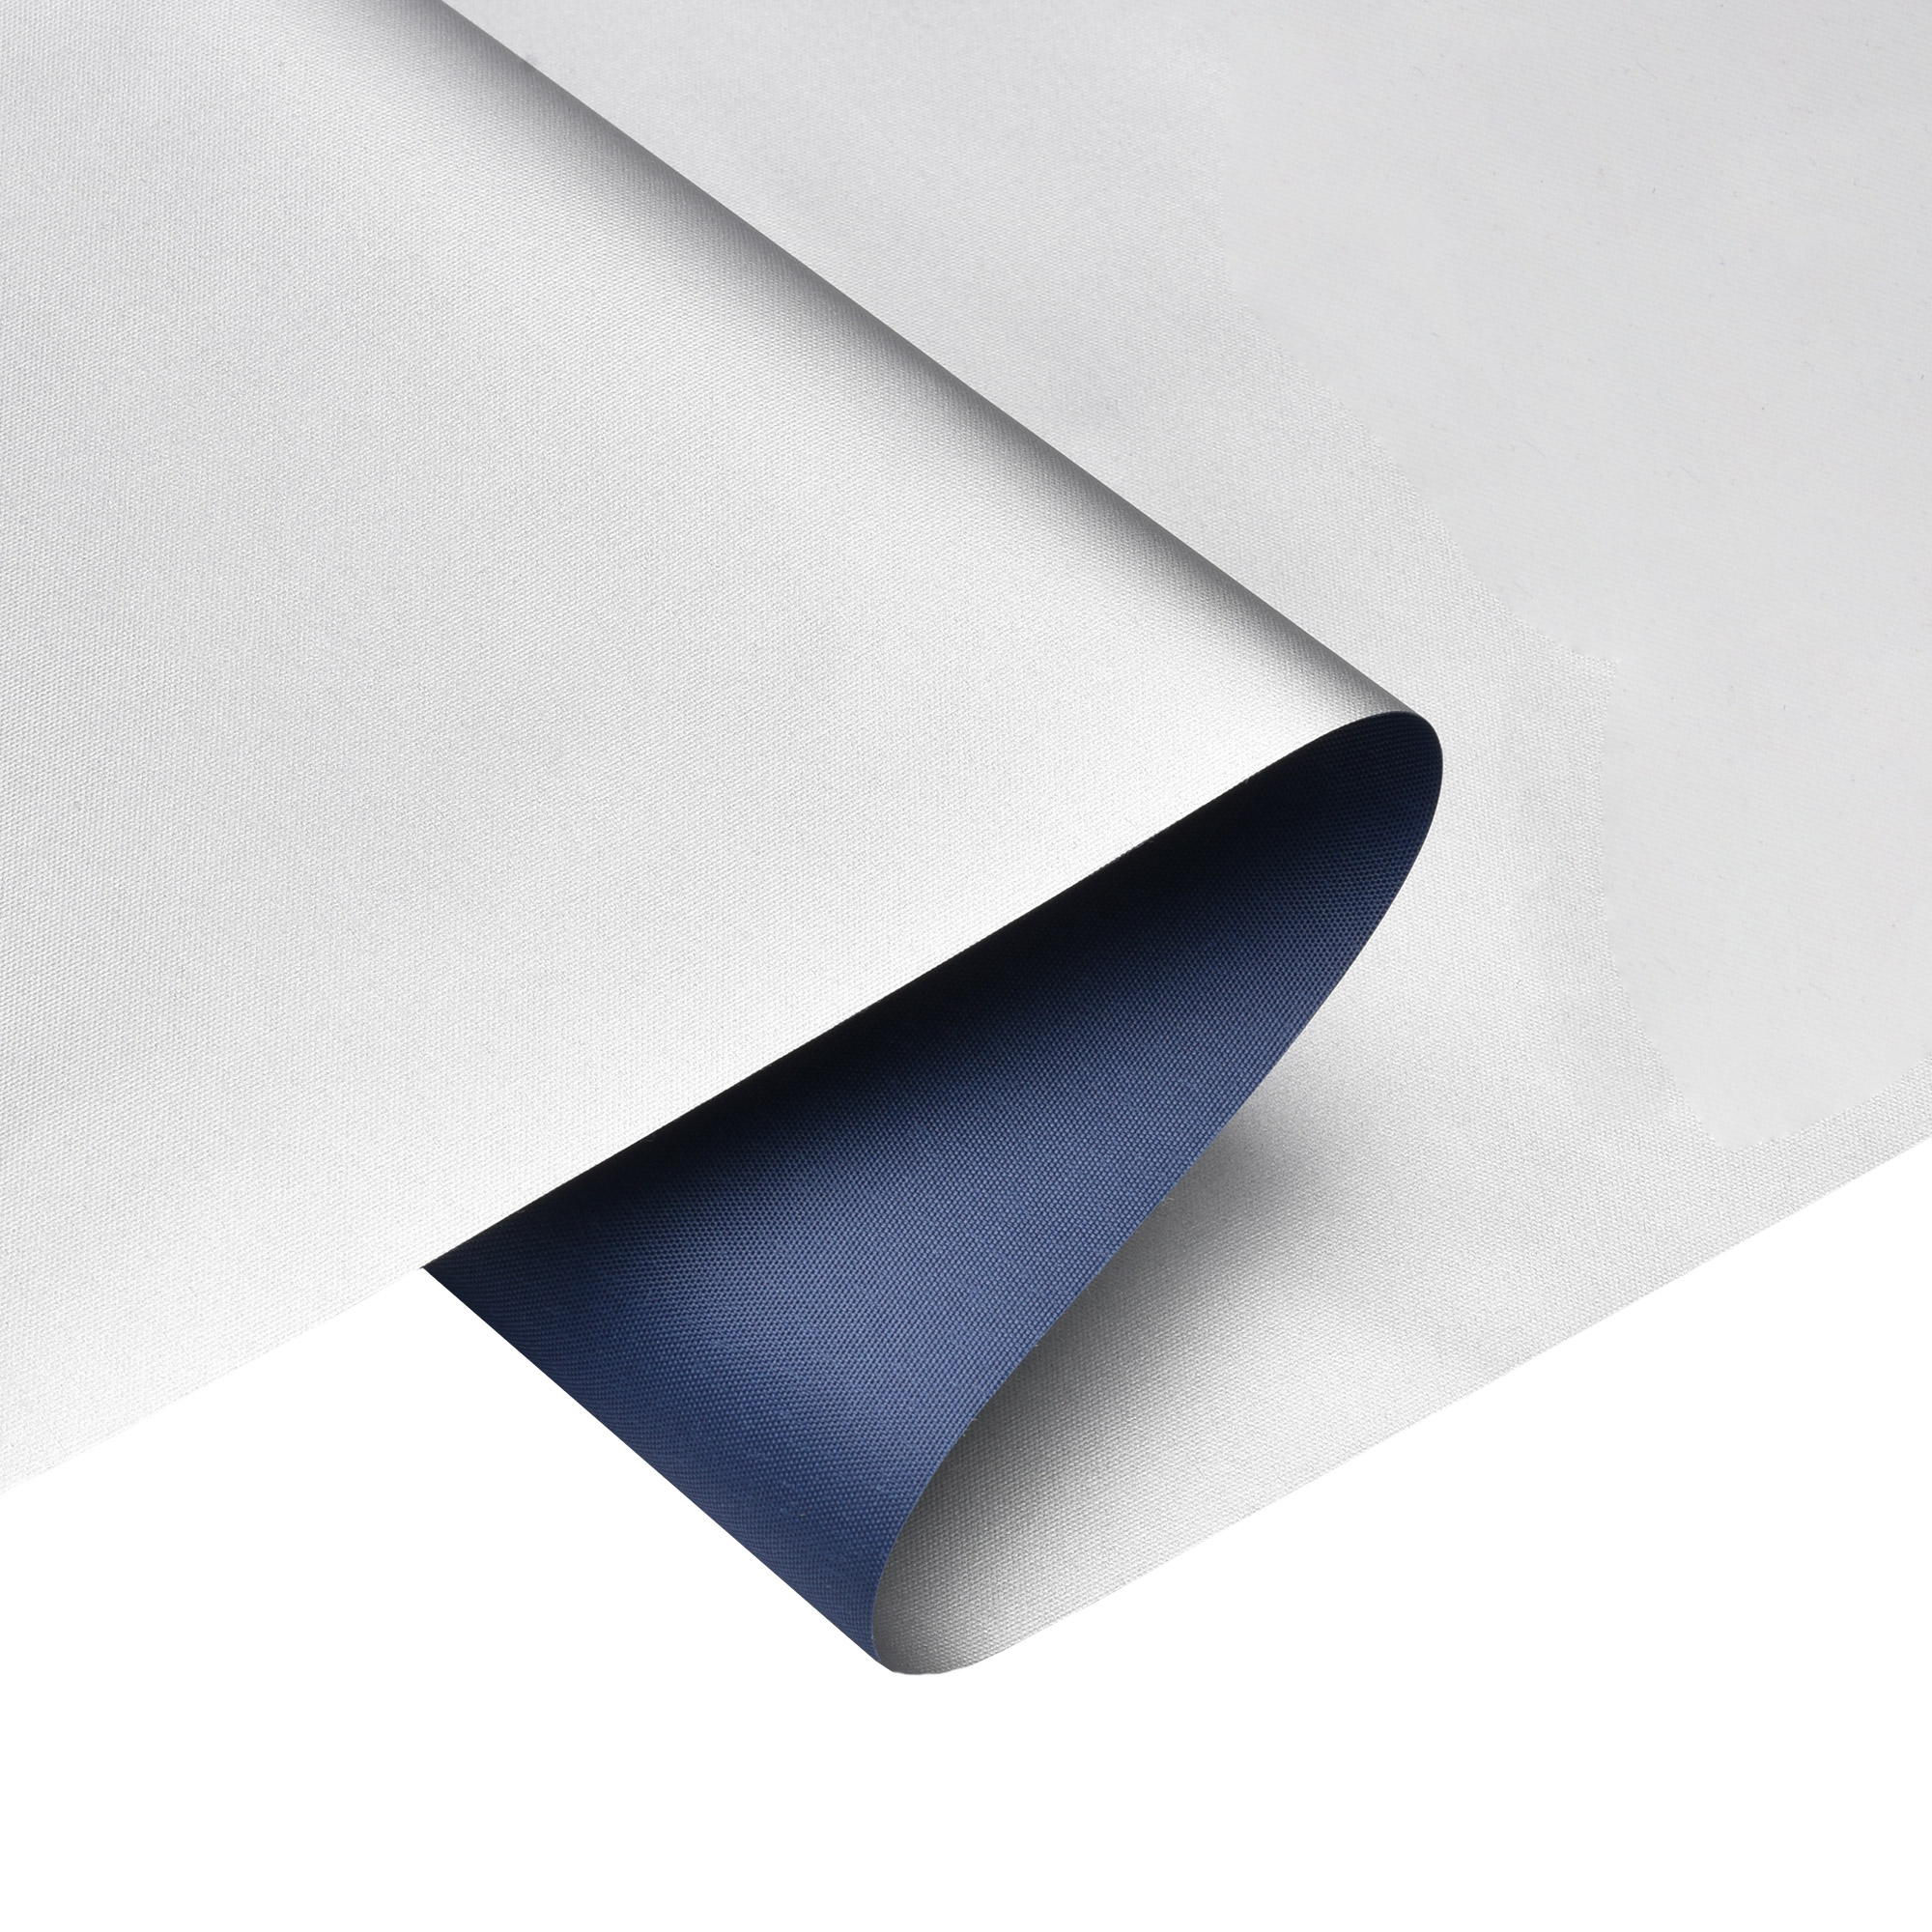 klemmfix thermorollo ohne bohren verdunklungsrollo seitenzugrollo fensterrollo ebay. Black Bedroom Furniture Sets. Home Design Ideas